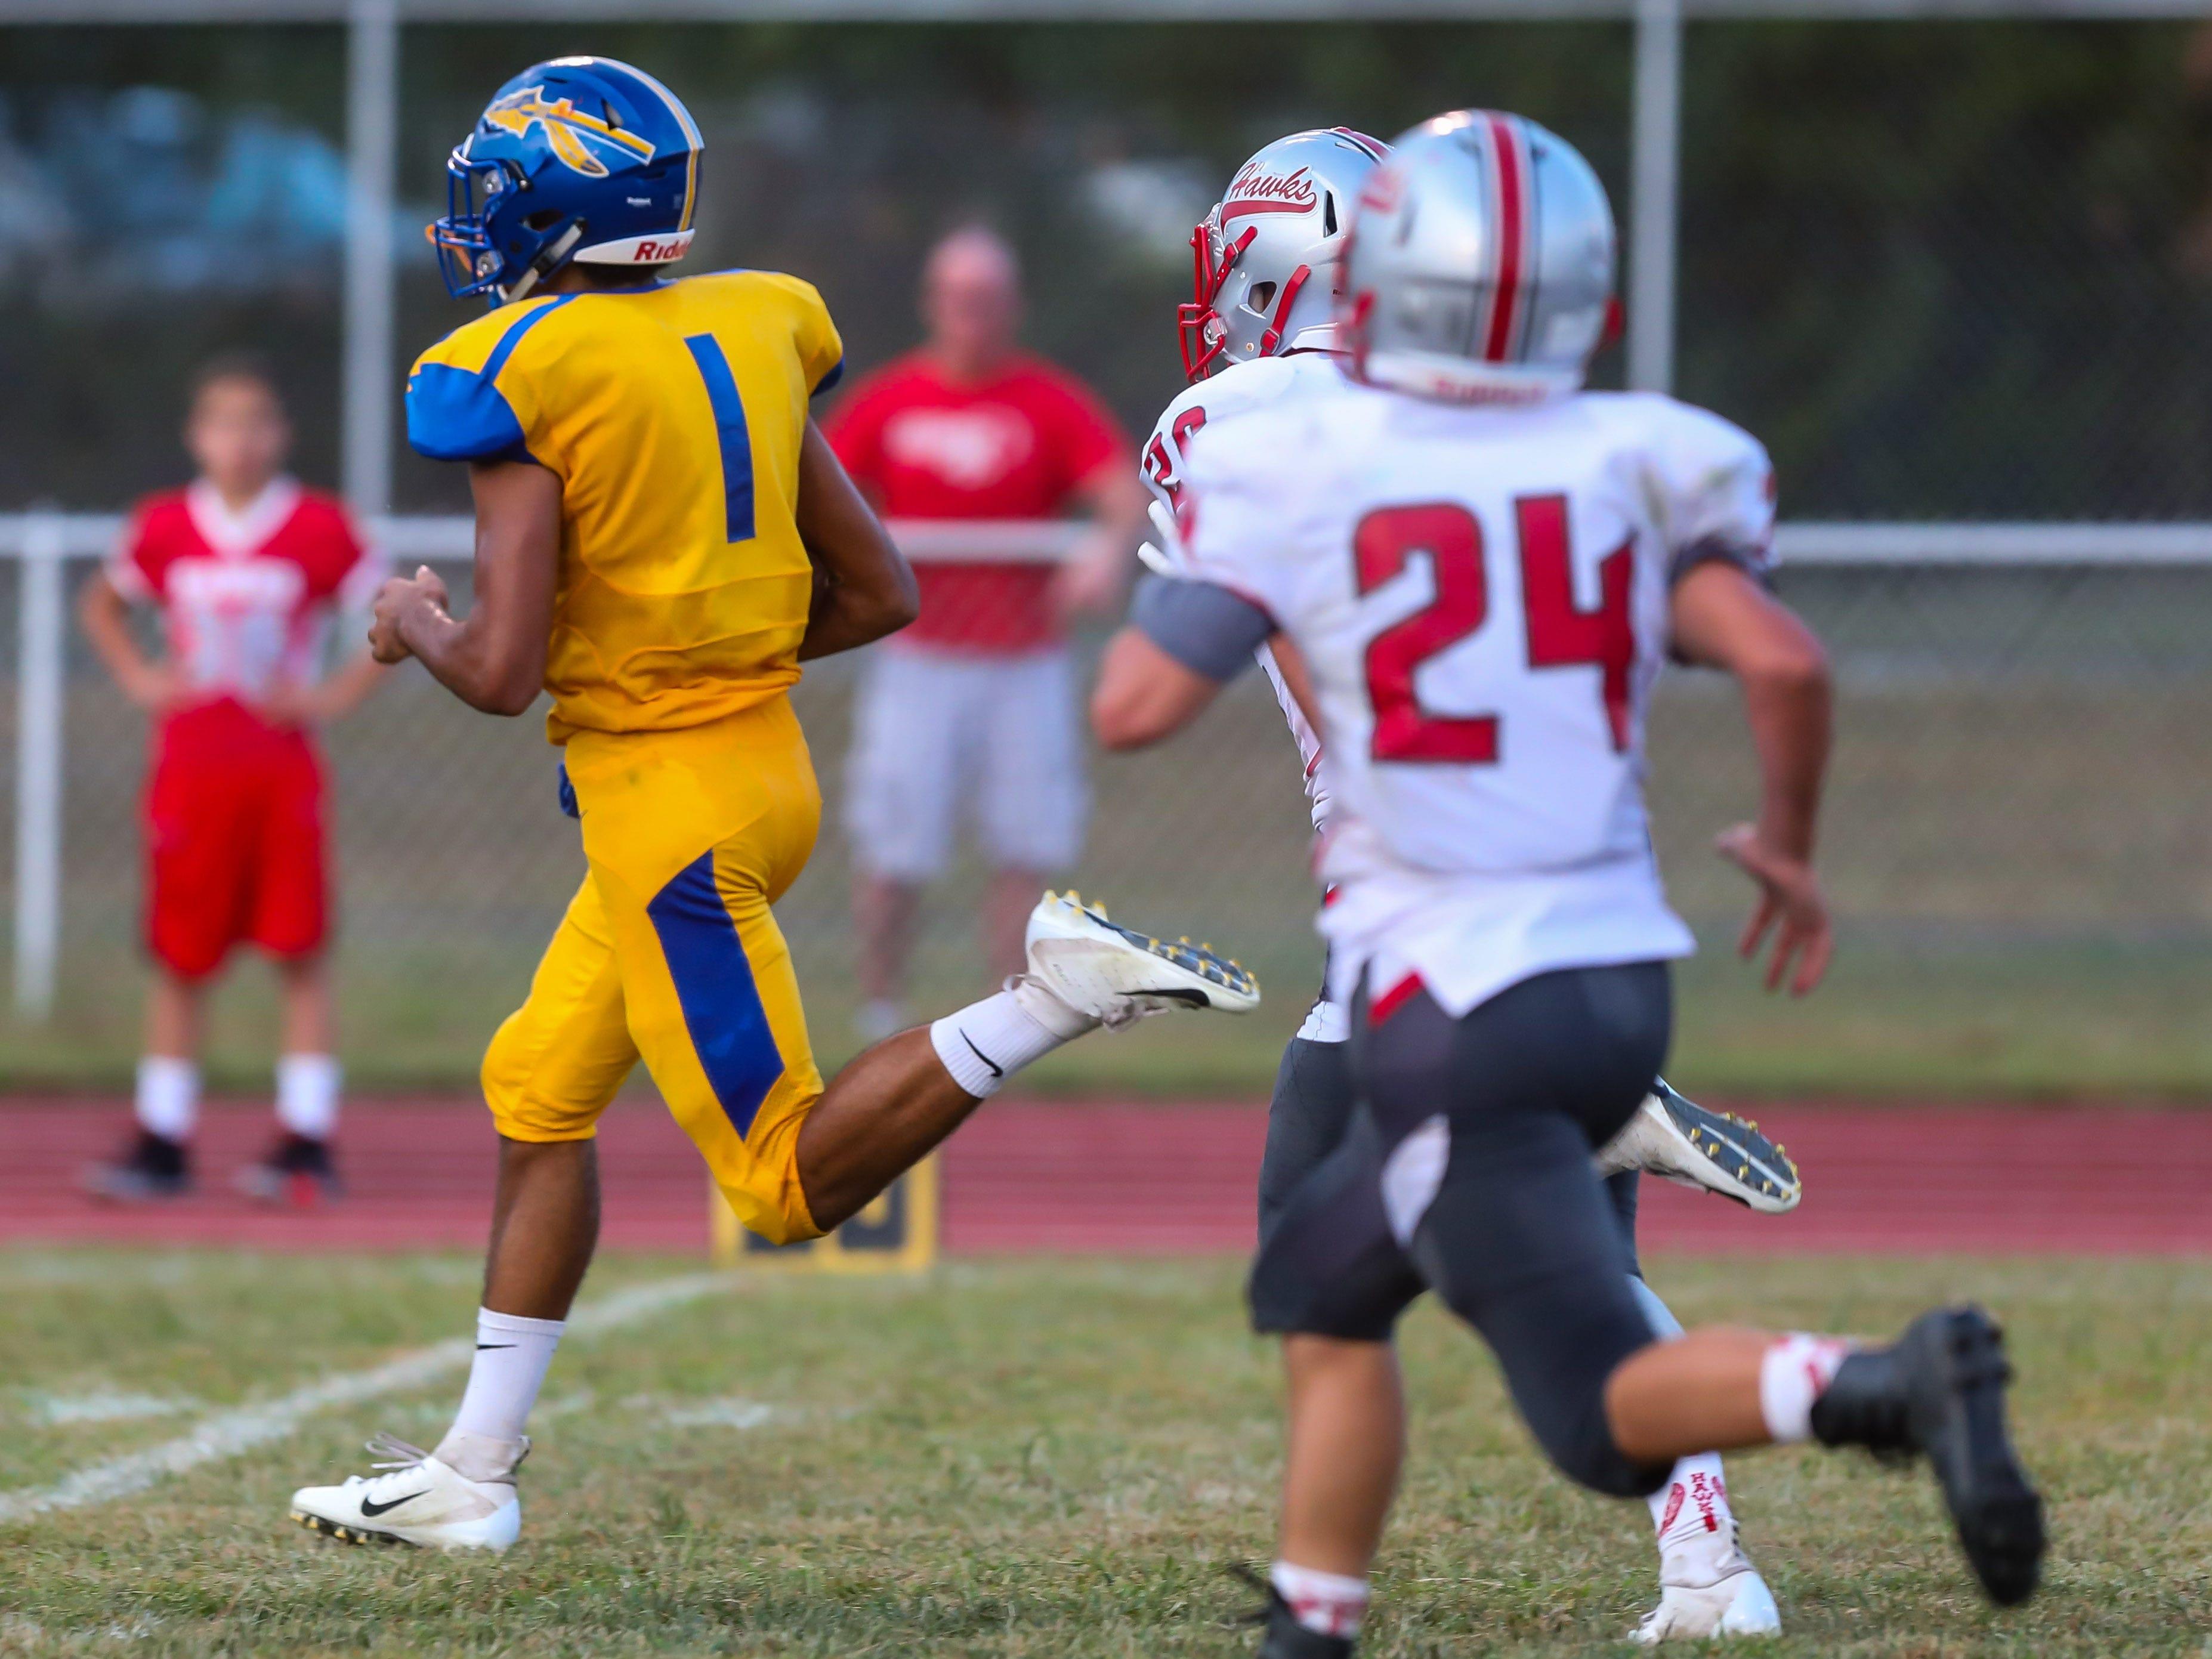 Buena's Chris Doughty runs for a 48 yard touchdown against Haddon Township at Buena High School, September 7, 2018.